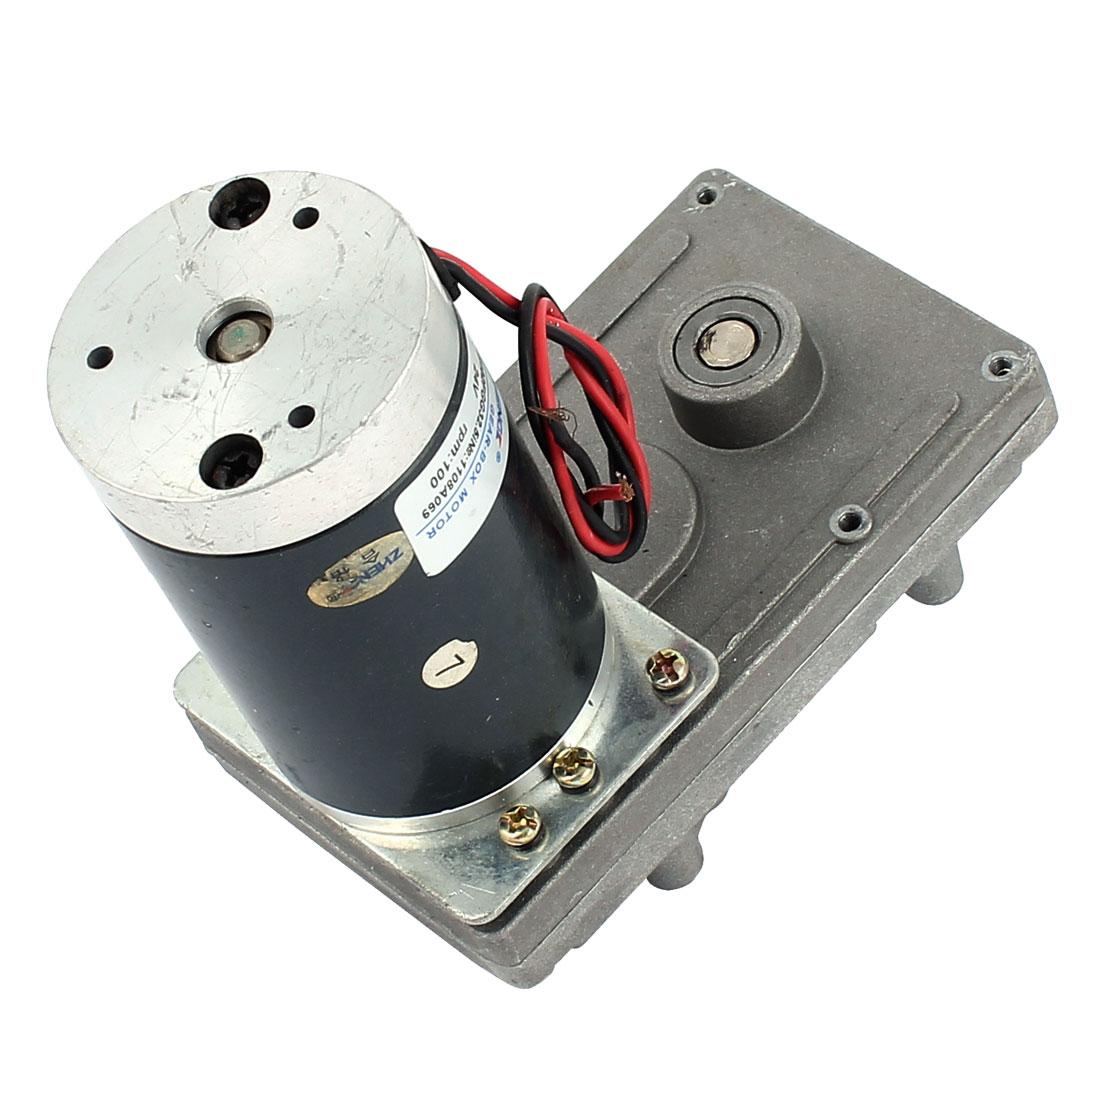 DC24V 100RPM High Torque DC Worm Turbo Gear Box Motor Speed Reducer